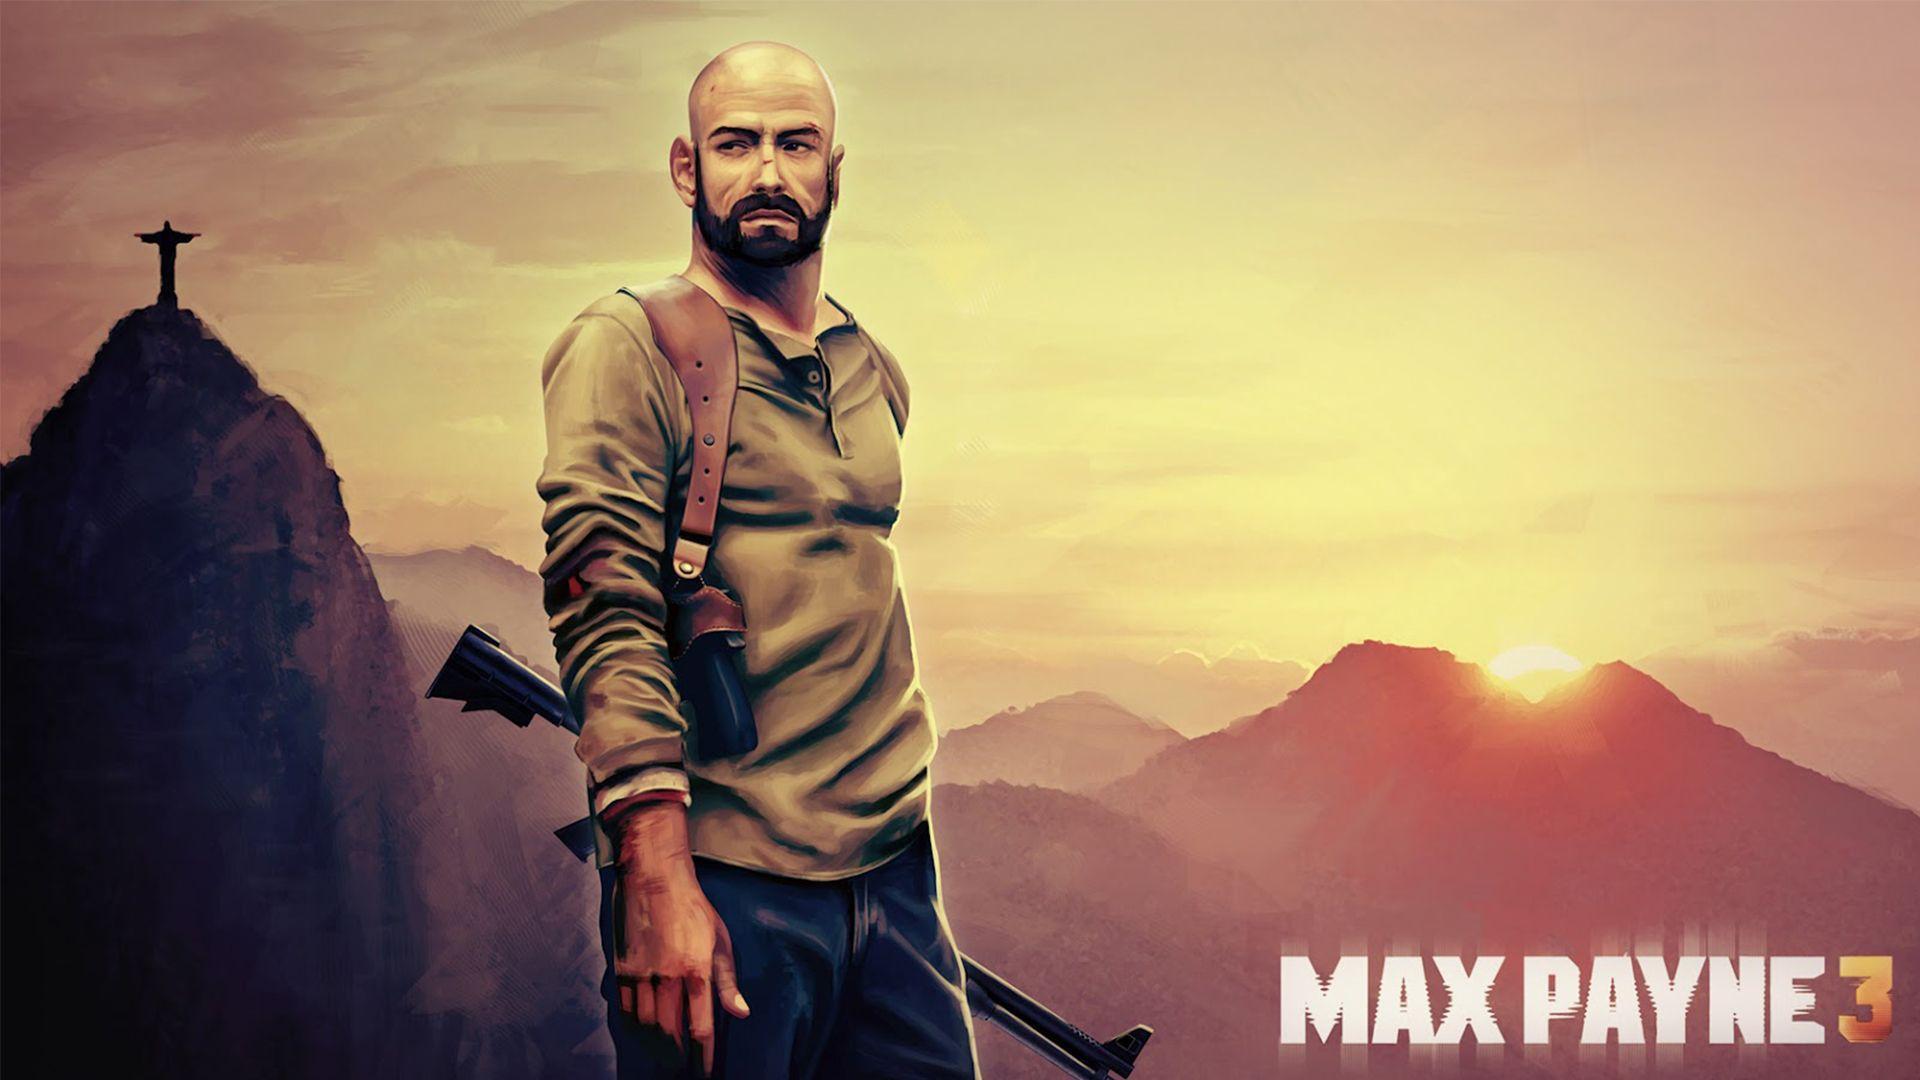 max payne 3 bald wallpaper